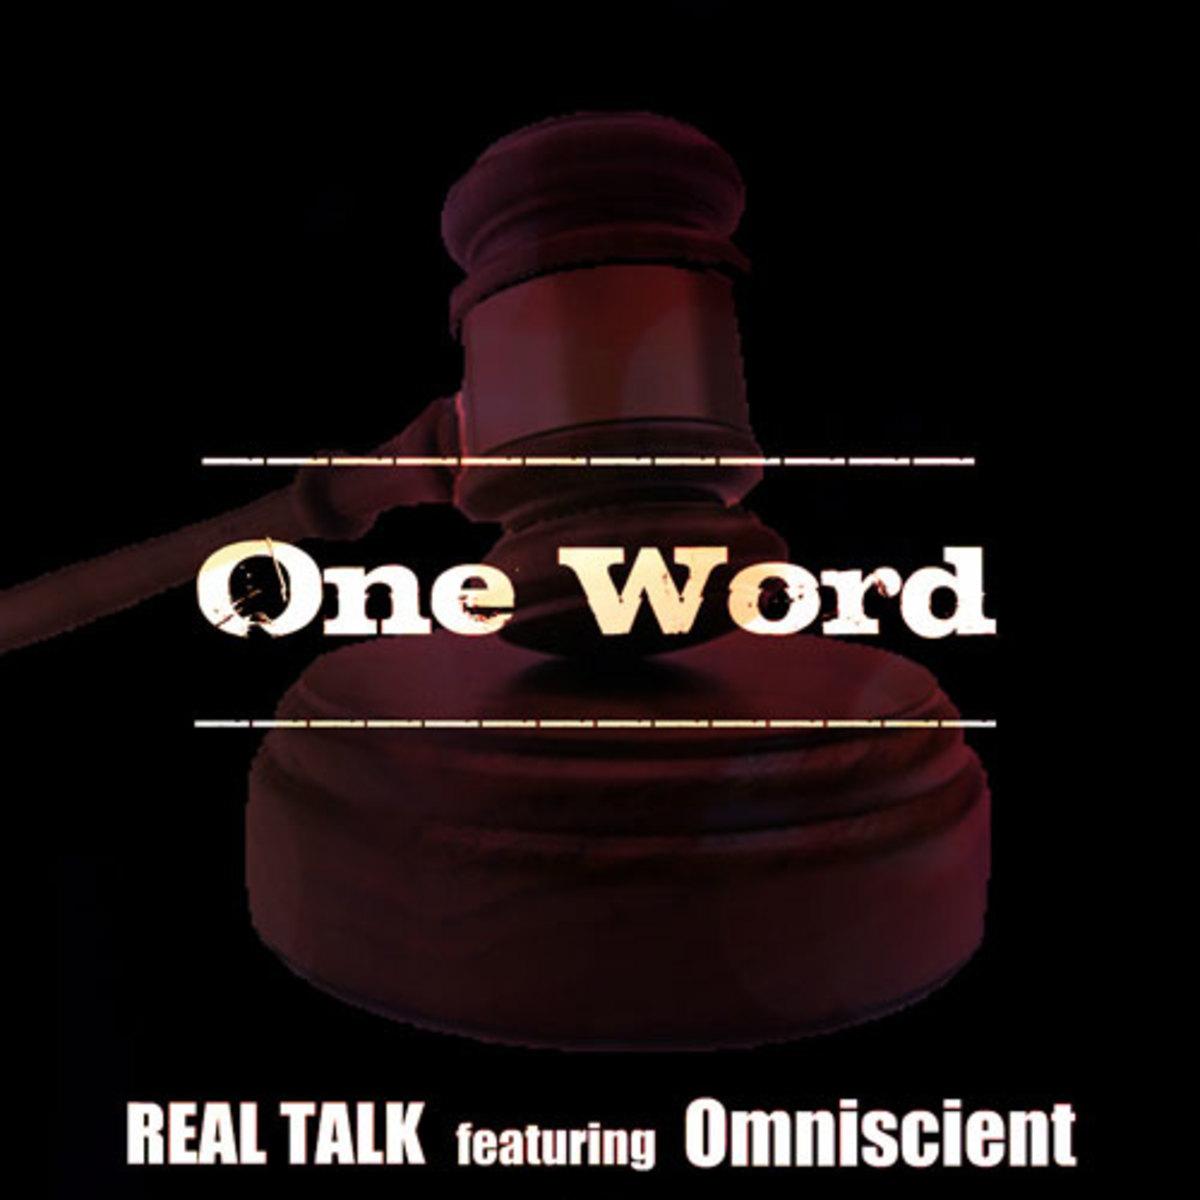 realtalk-oneword.jpg